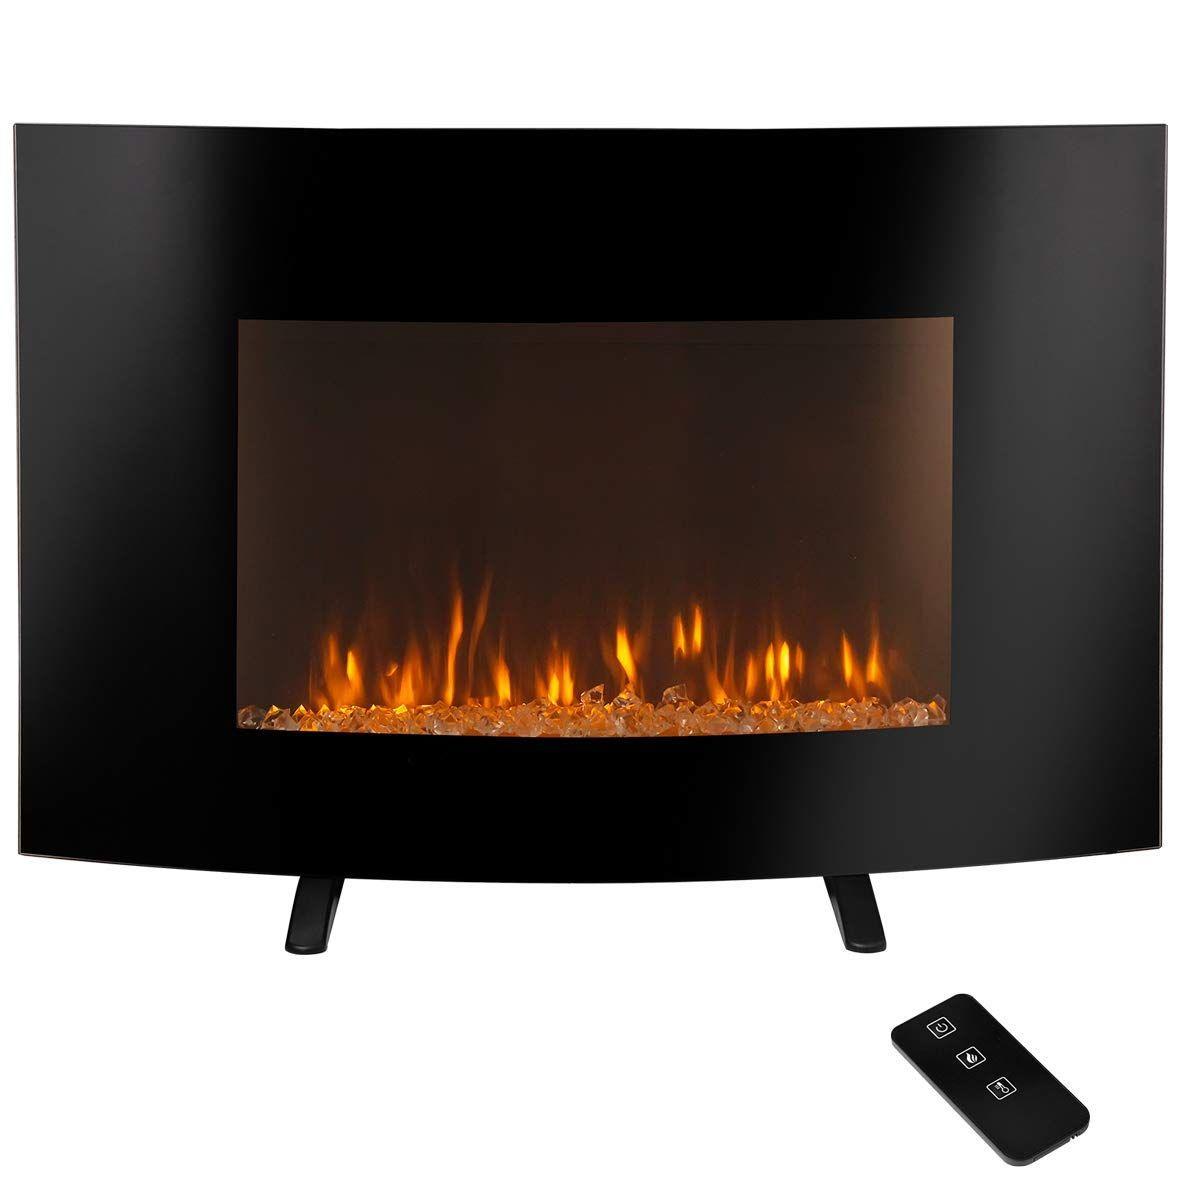 Amazon Com Bhi Electric Fireplace 3 Color Flame Wall Mount